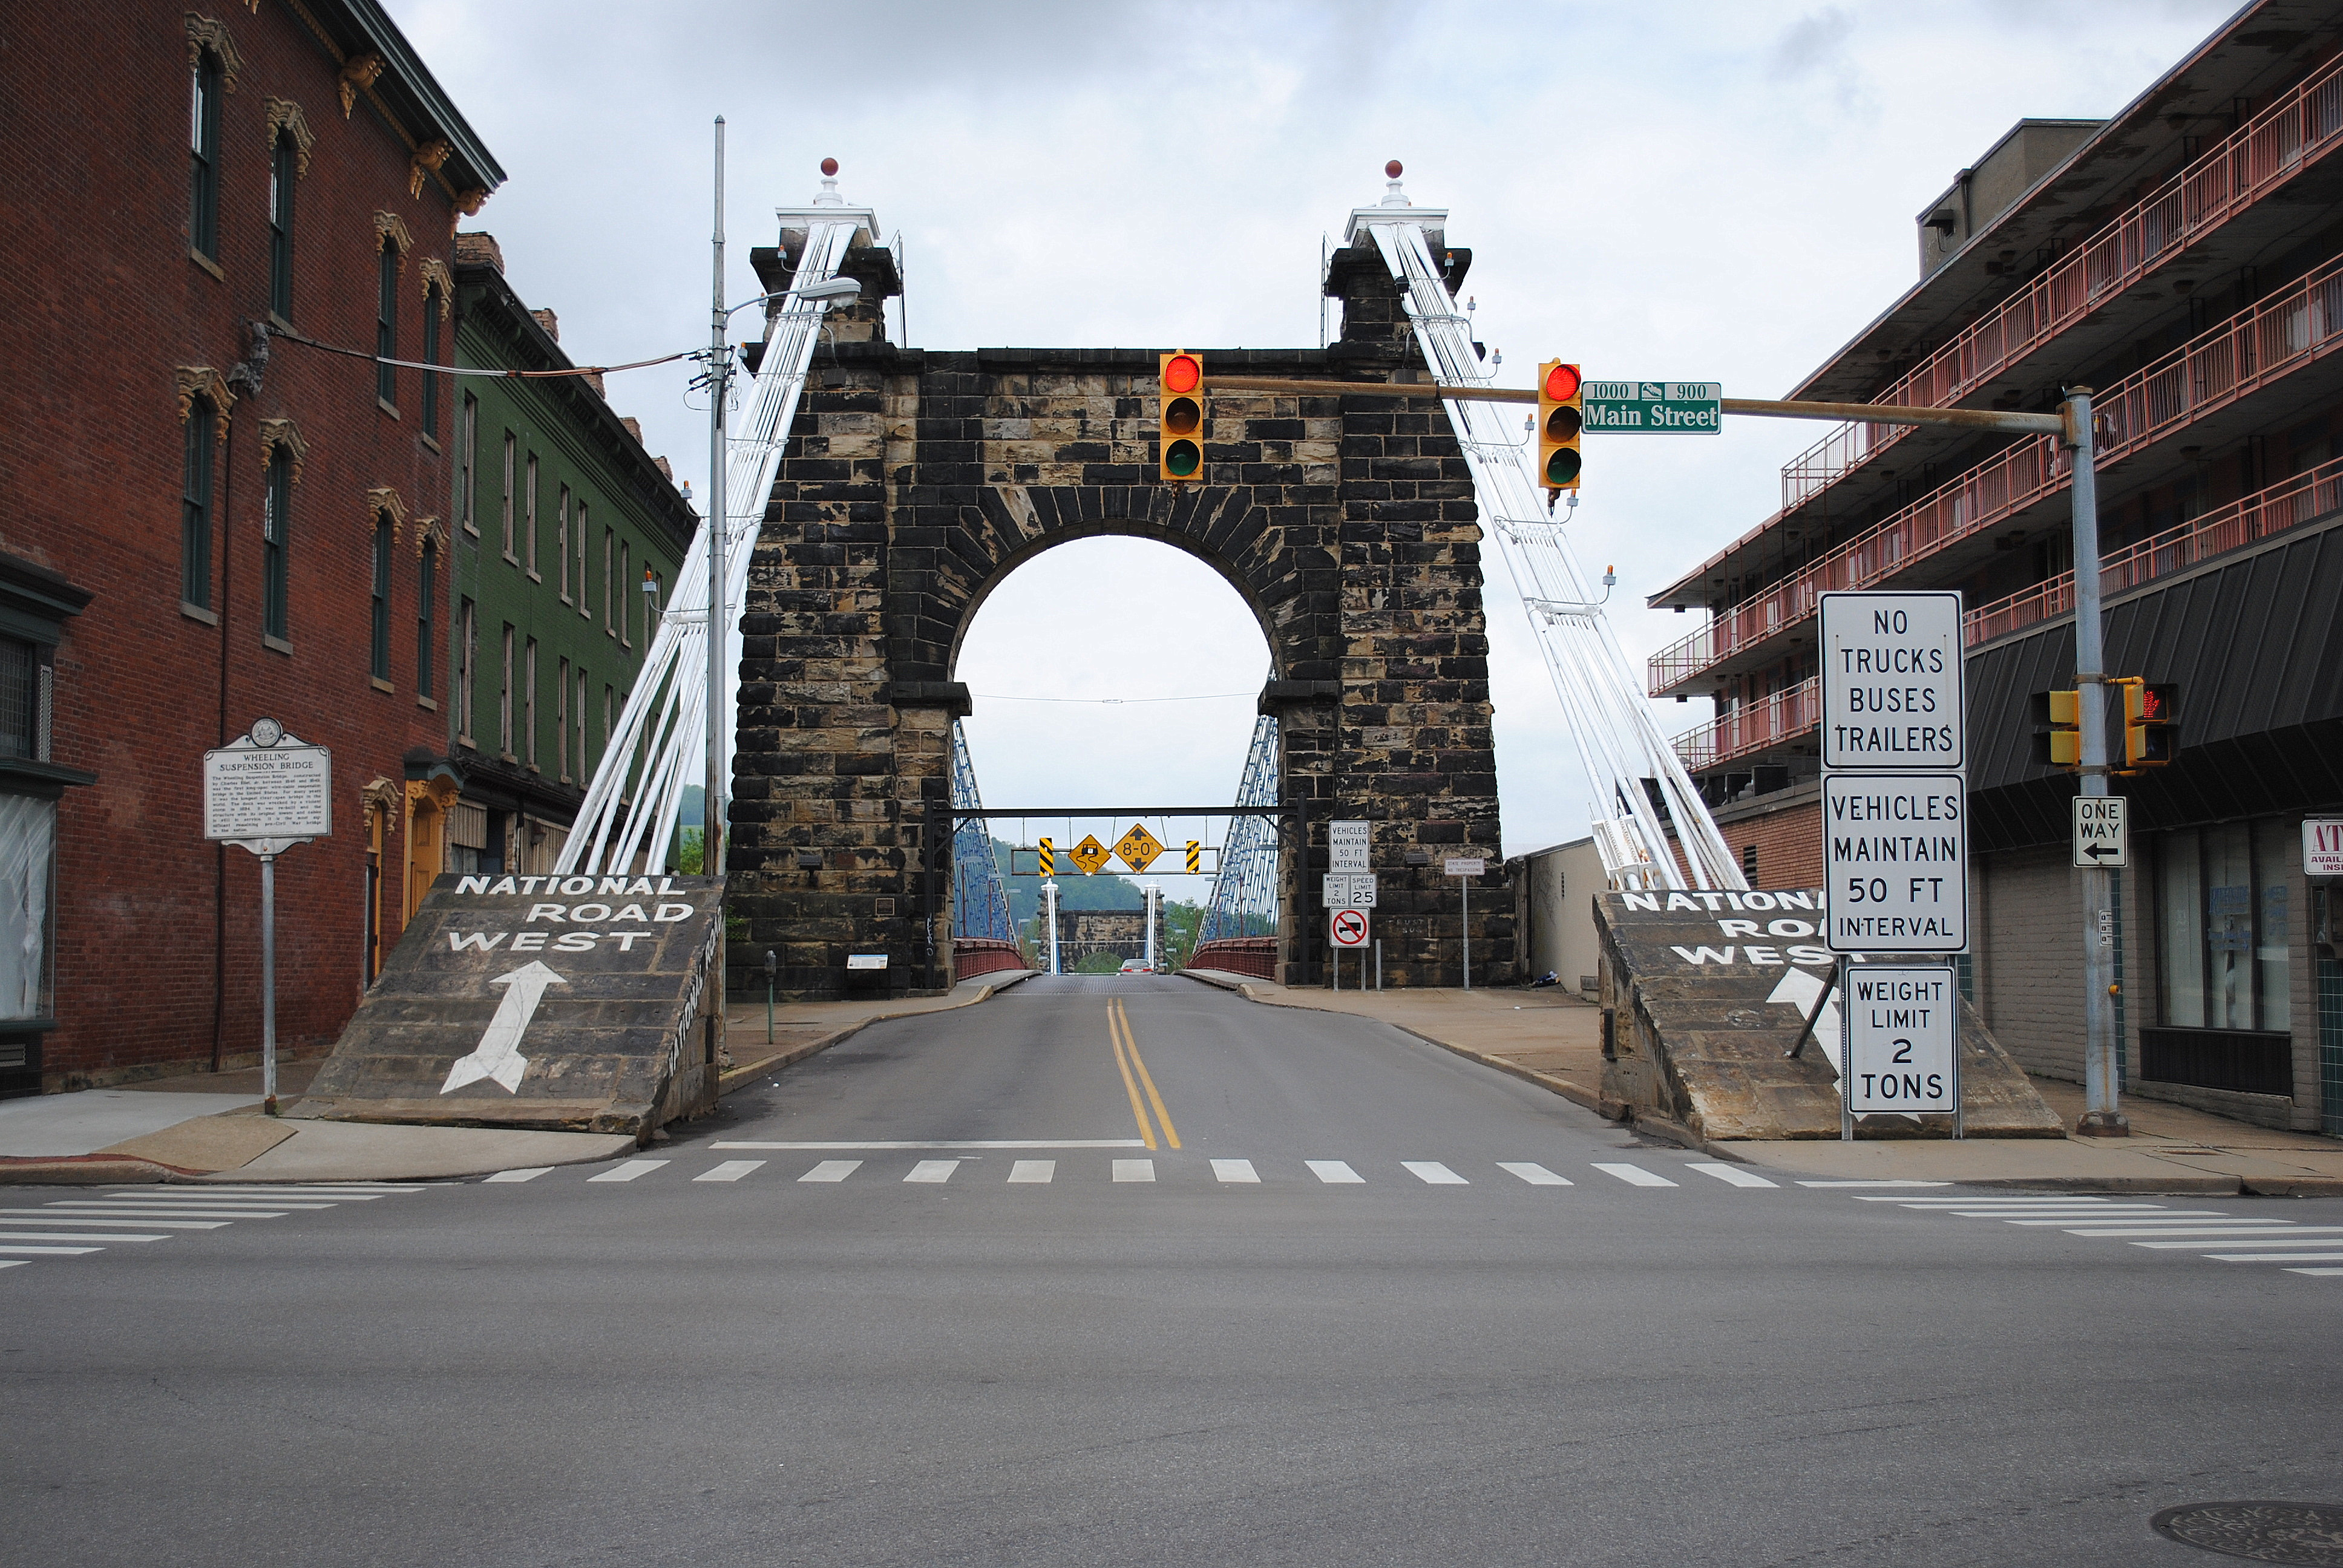 Ohio belmont county flushing - Road Bridge West Island Grid Virginia Us Suspension Steel Route Wv National 40 Wheeling